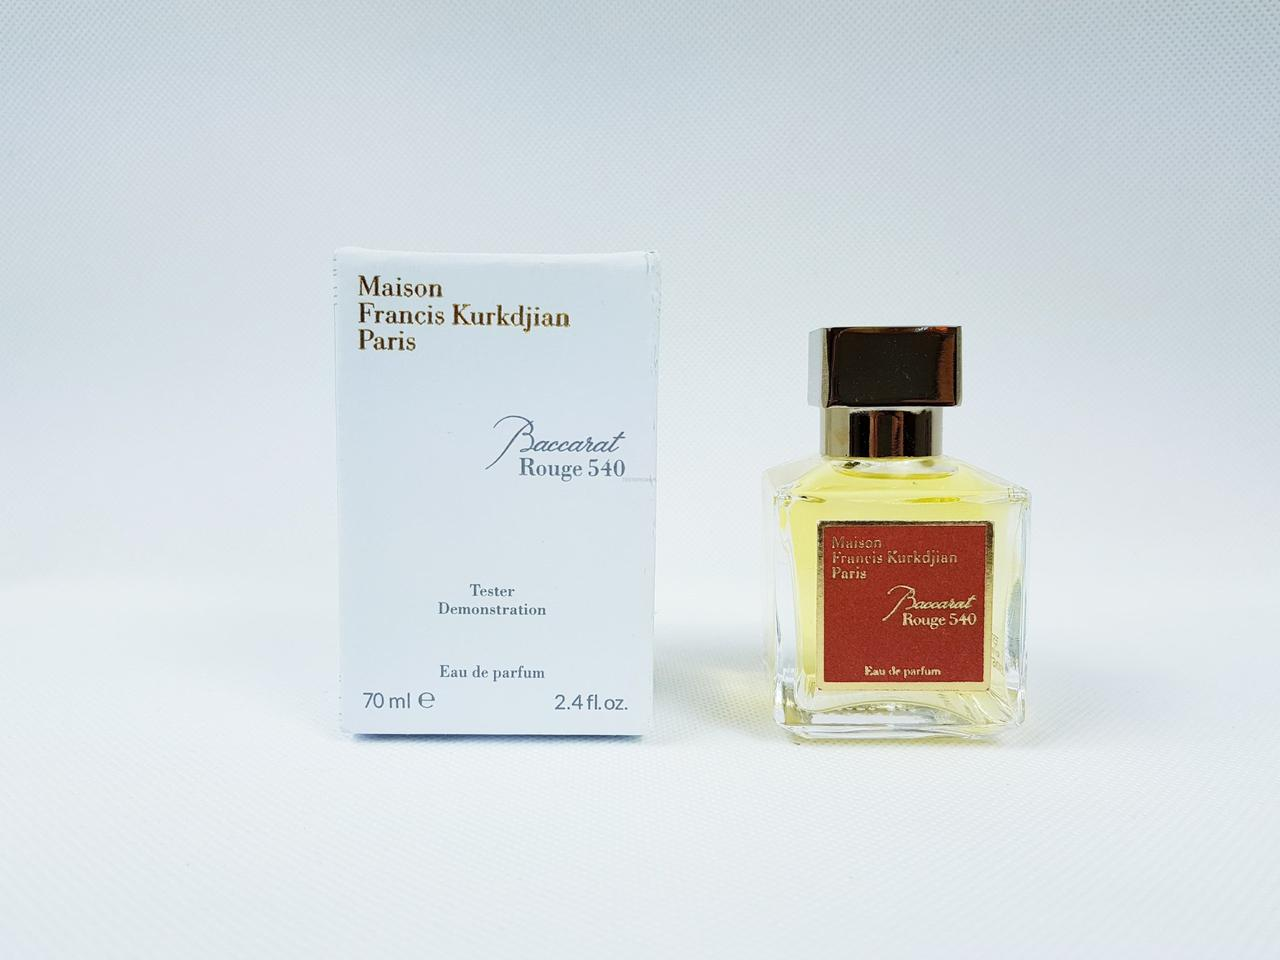 Maison Francis Kurkdjian Baccarat Rouge 540 70 ml. - Парфюмированная вода - Унисекс (тестер )